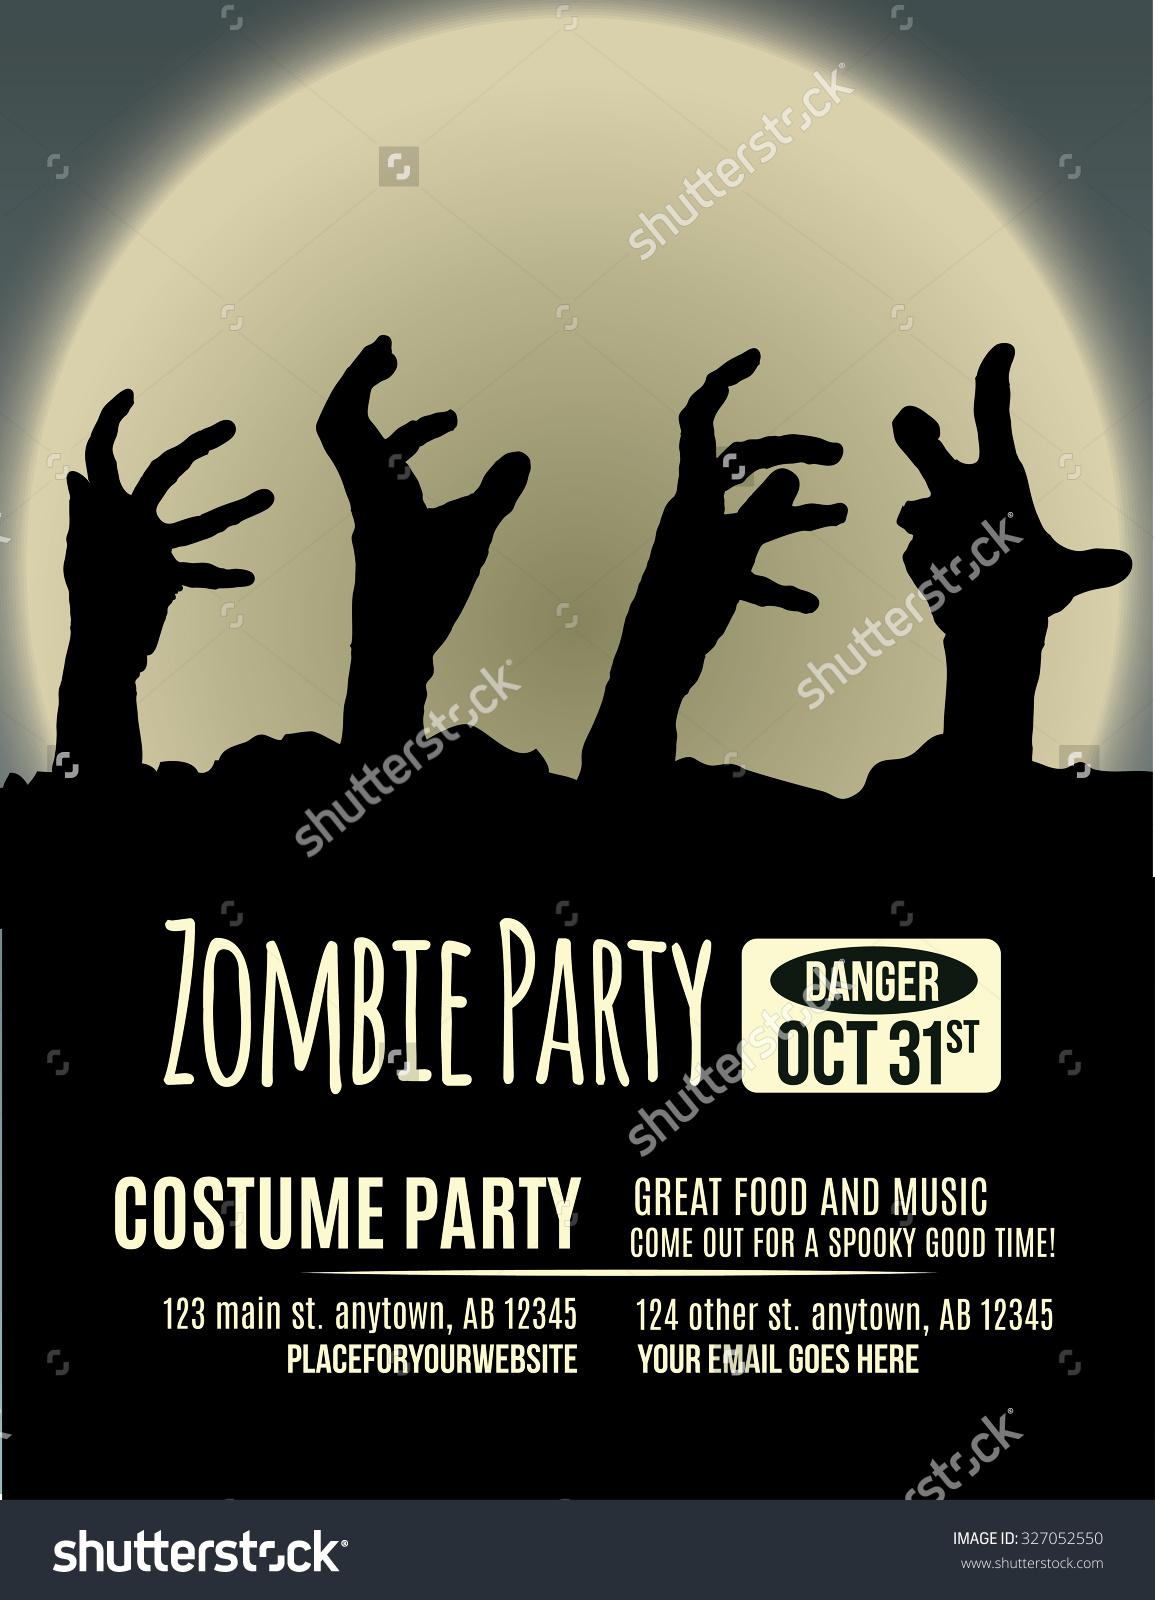 Halloween Party Invitation Zombie Hands Coming Stock Vector